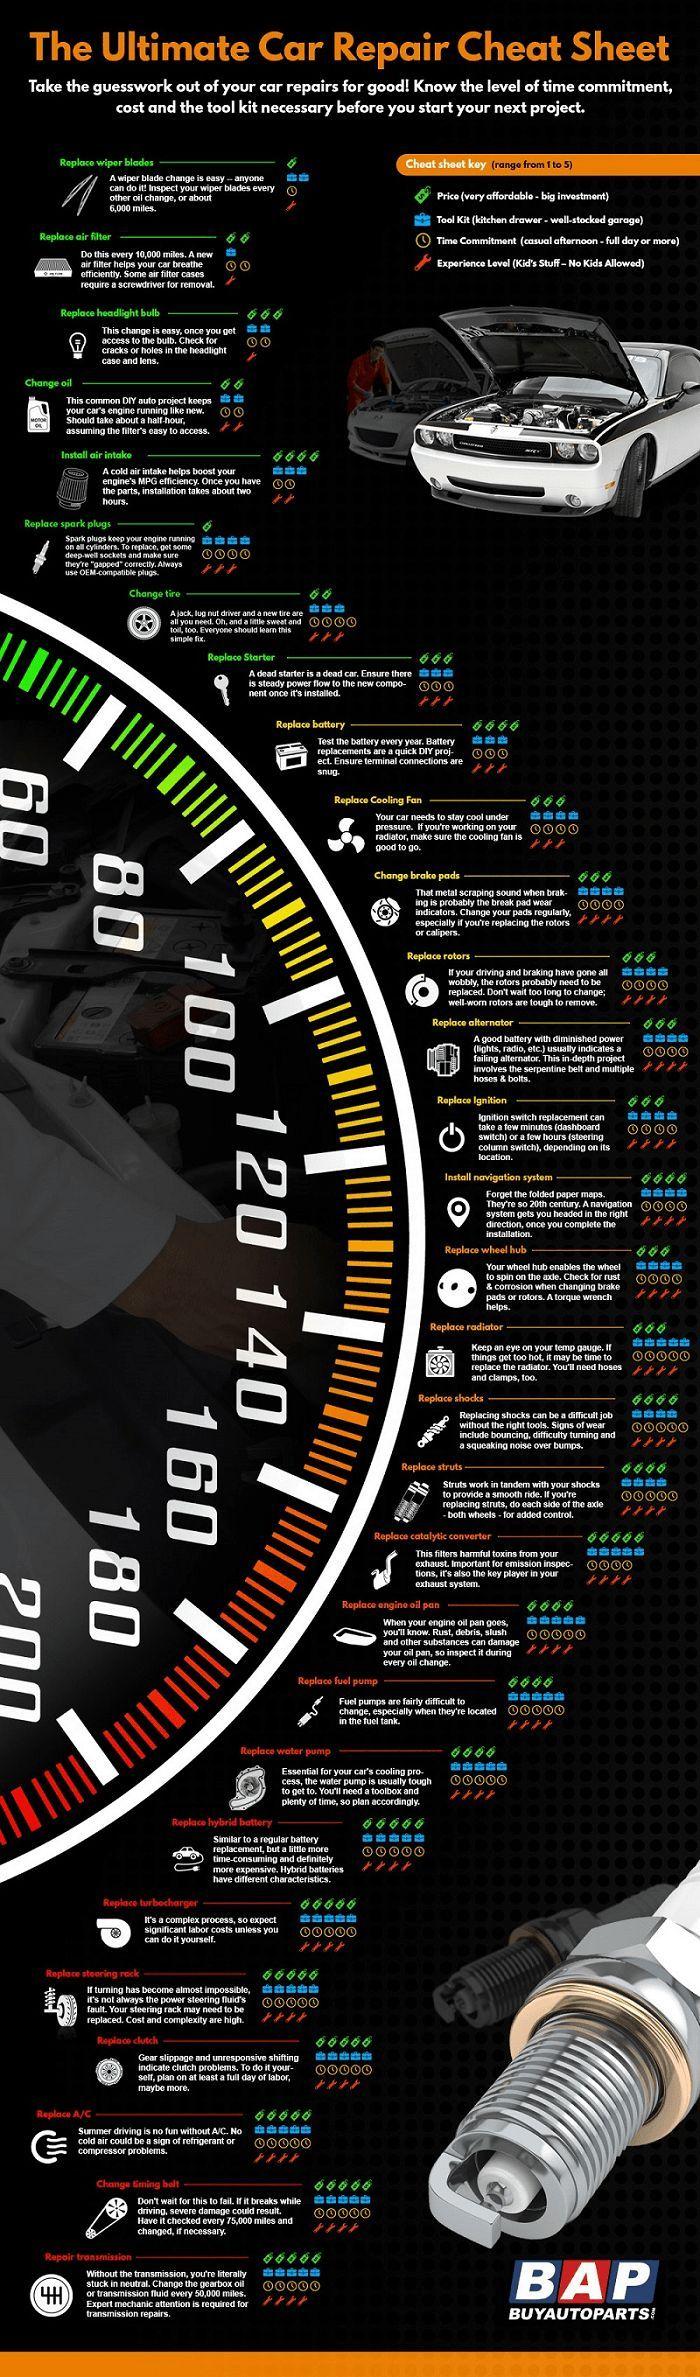 Infographic The Ultimate Car Repair Cheat Sheet Car Hacks Car Maintenance Car Mechanic